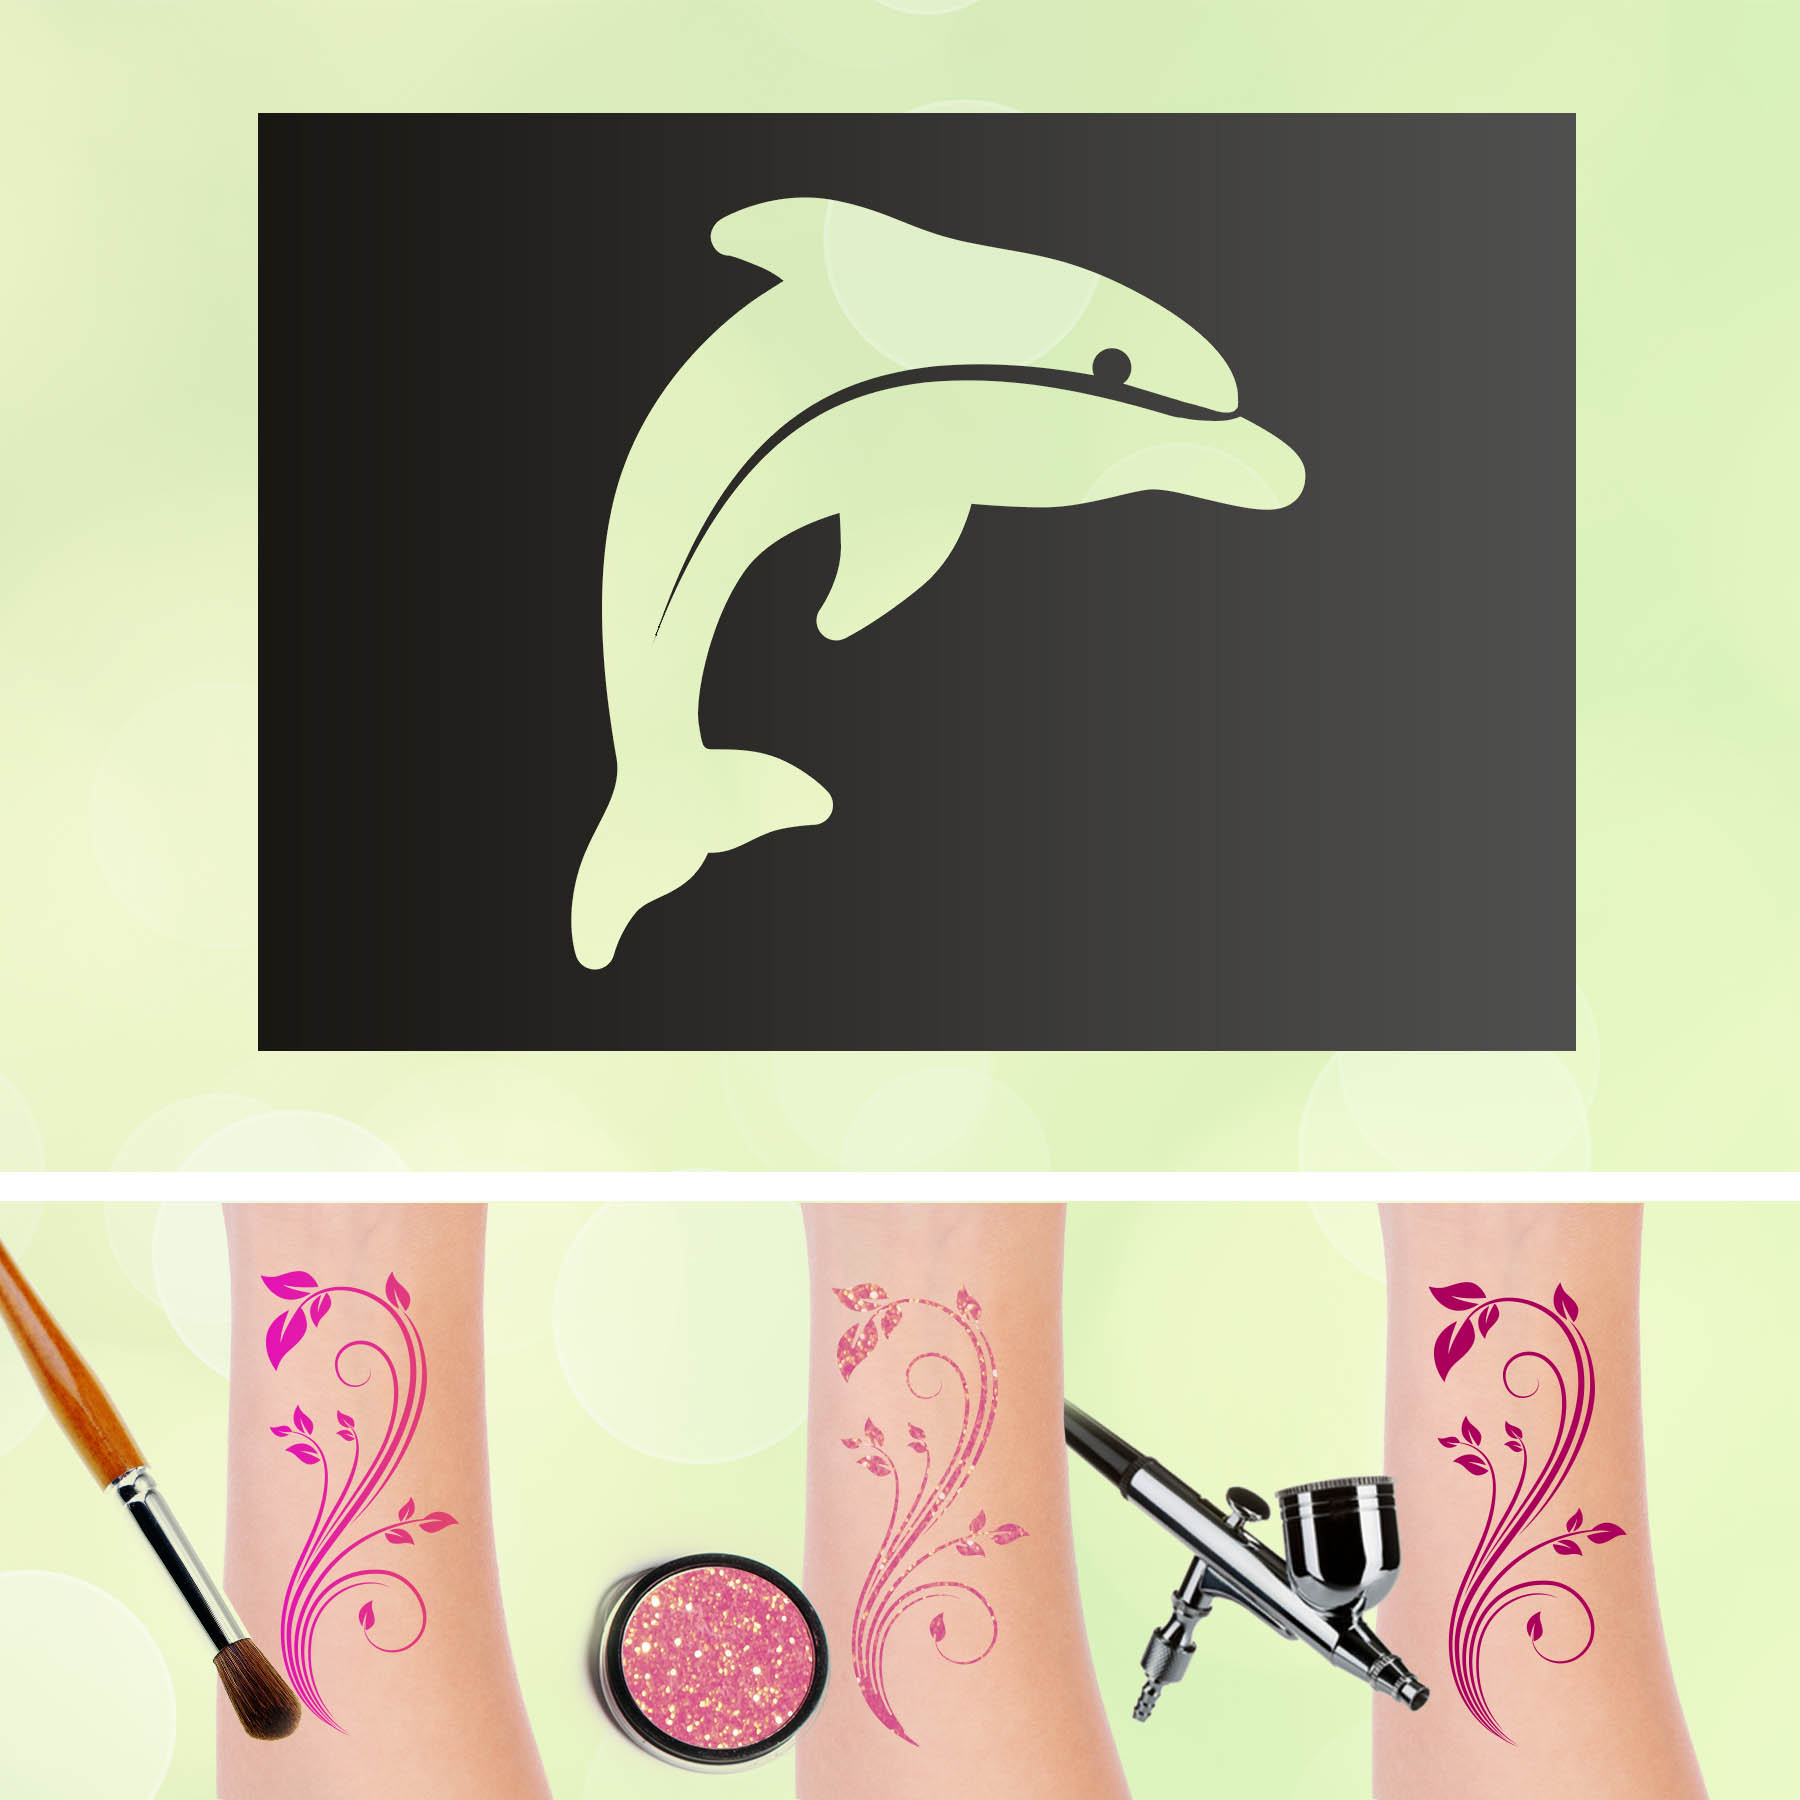 Tattoo Schablonen Delphin Selbstklebend Kinderschminken Airbrush